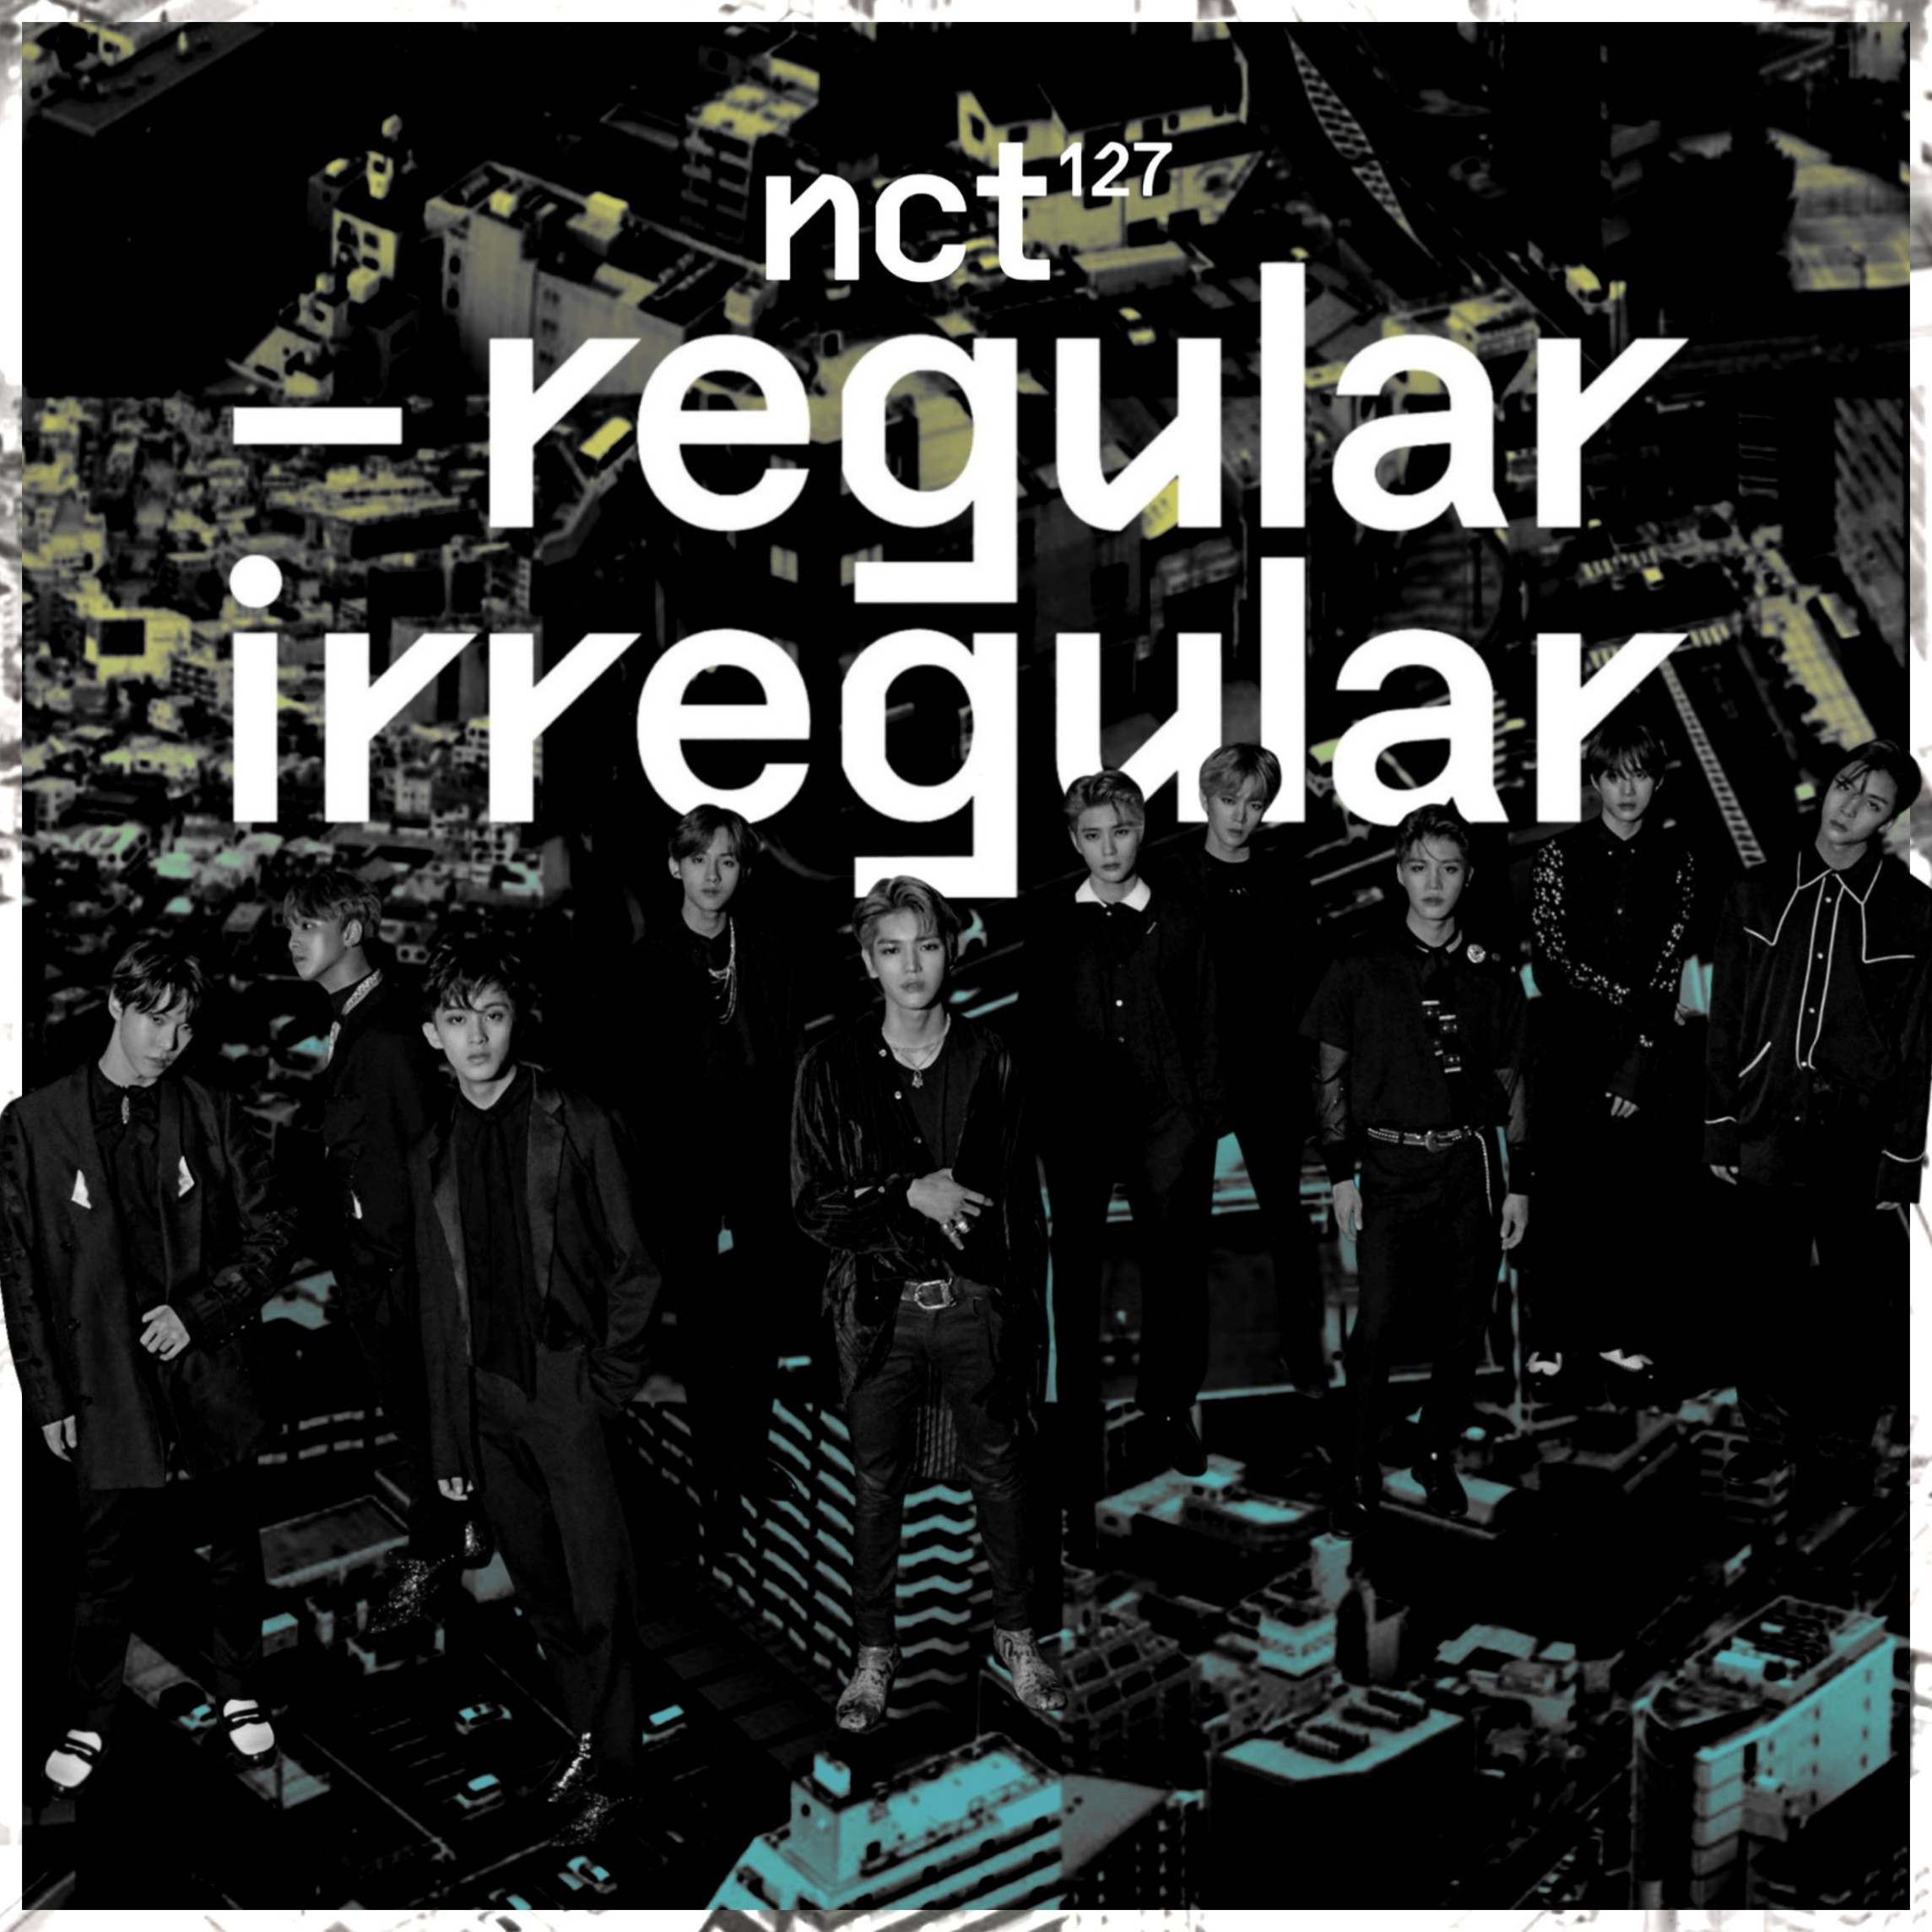 NCT 127 REGULAR-IRREGULAR / THE 1ST ALBUM cover by LEAlbum